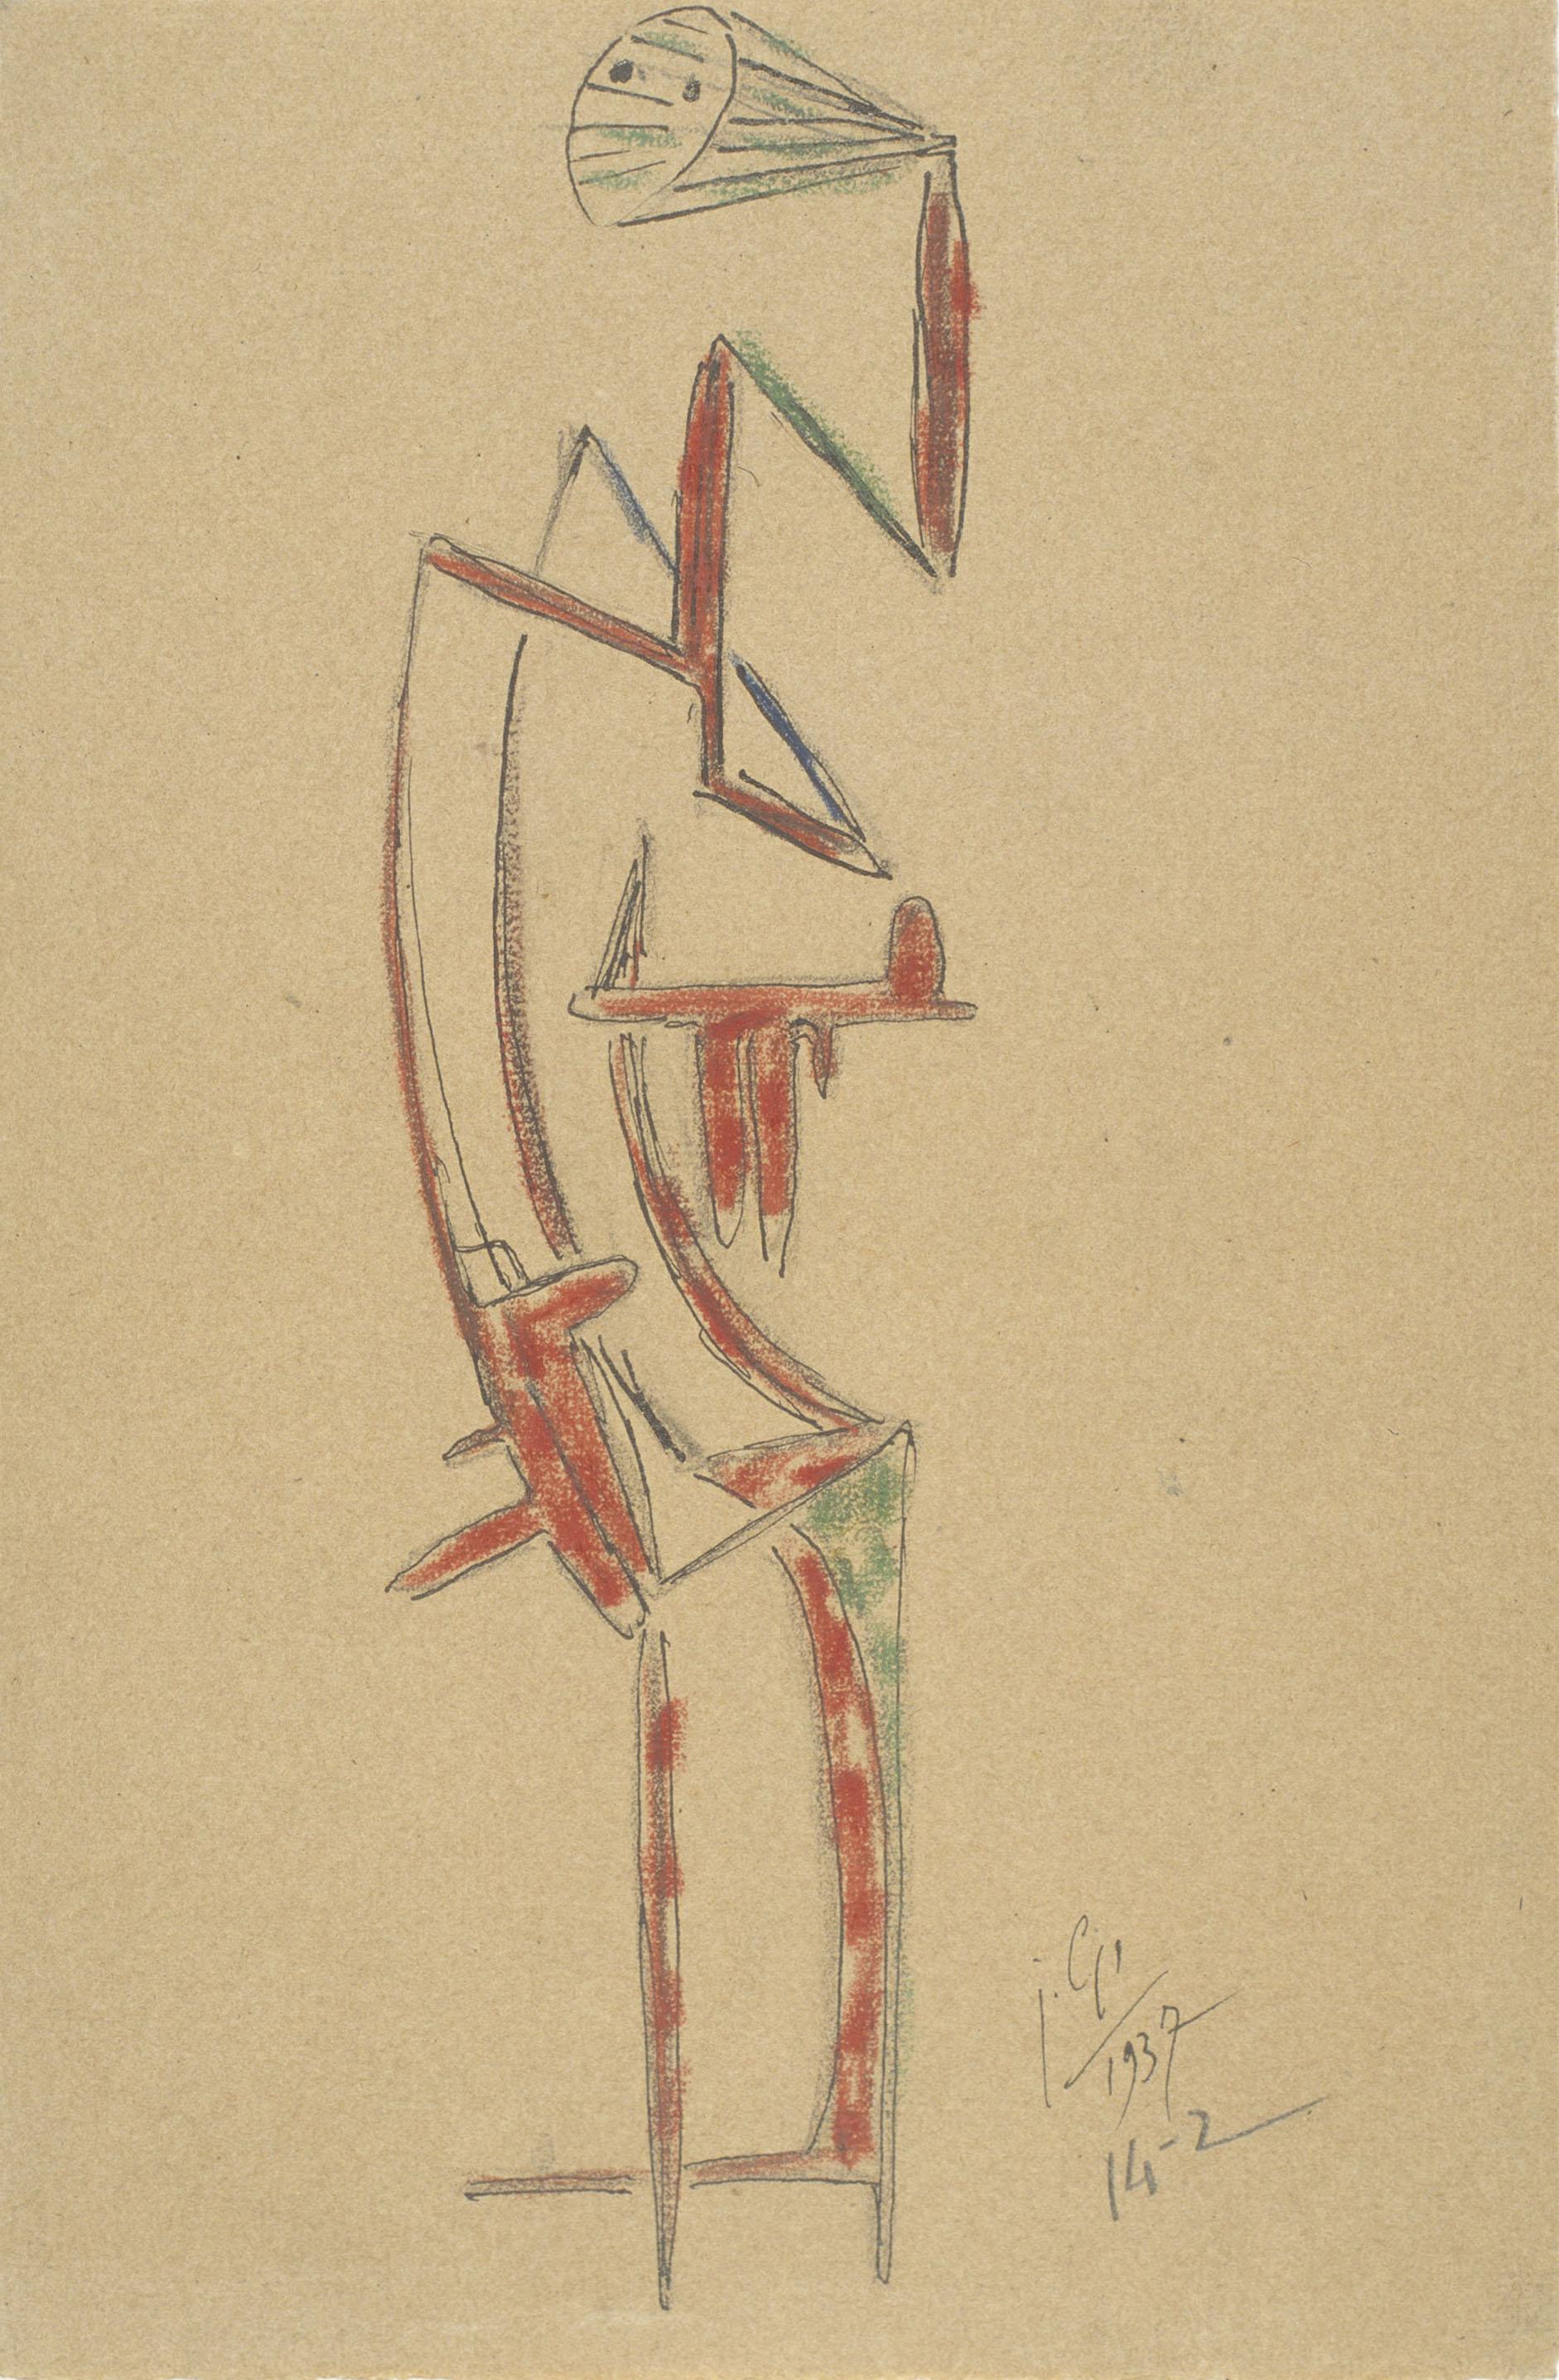 Juli González - Personatge entremaliat (Personnage mutin) - 1937